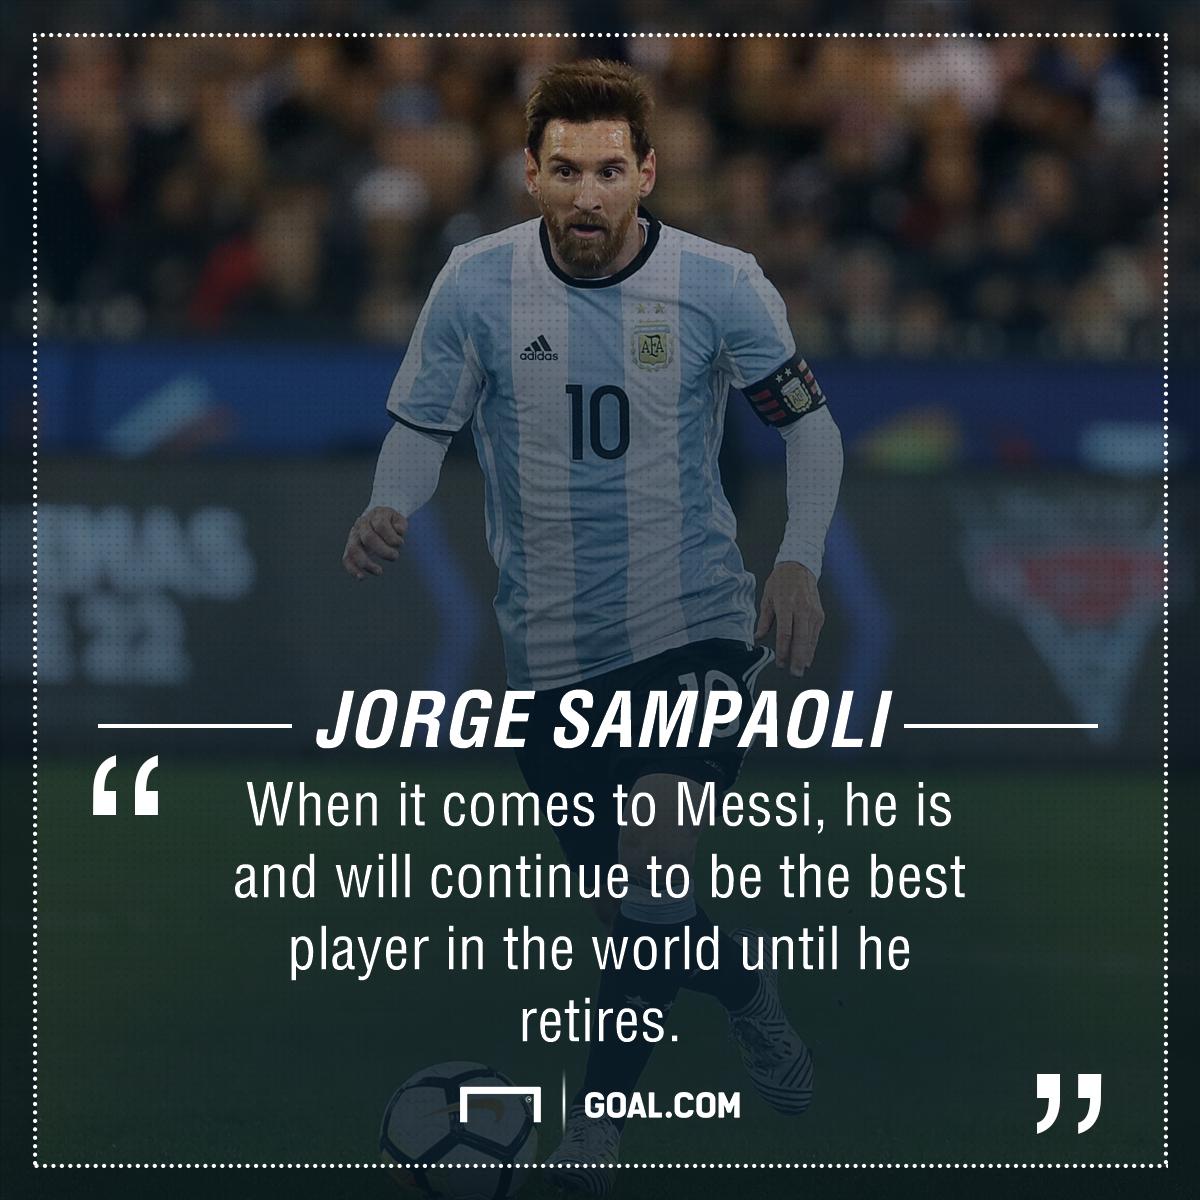 Jorge Sampaoli Lionel Messi